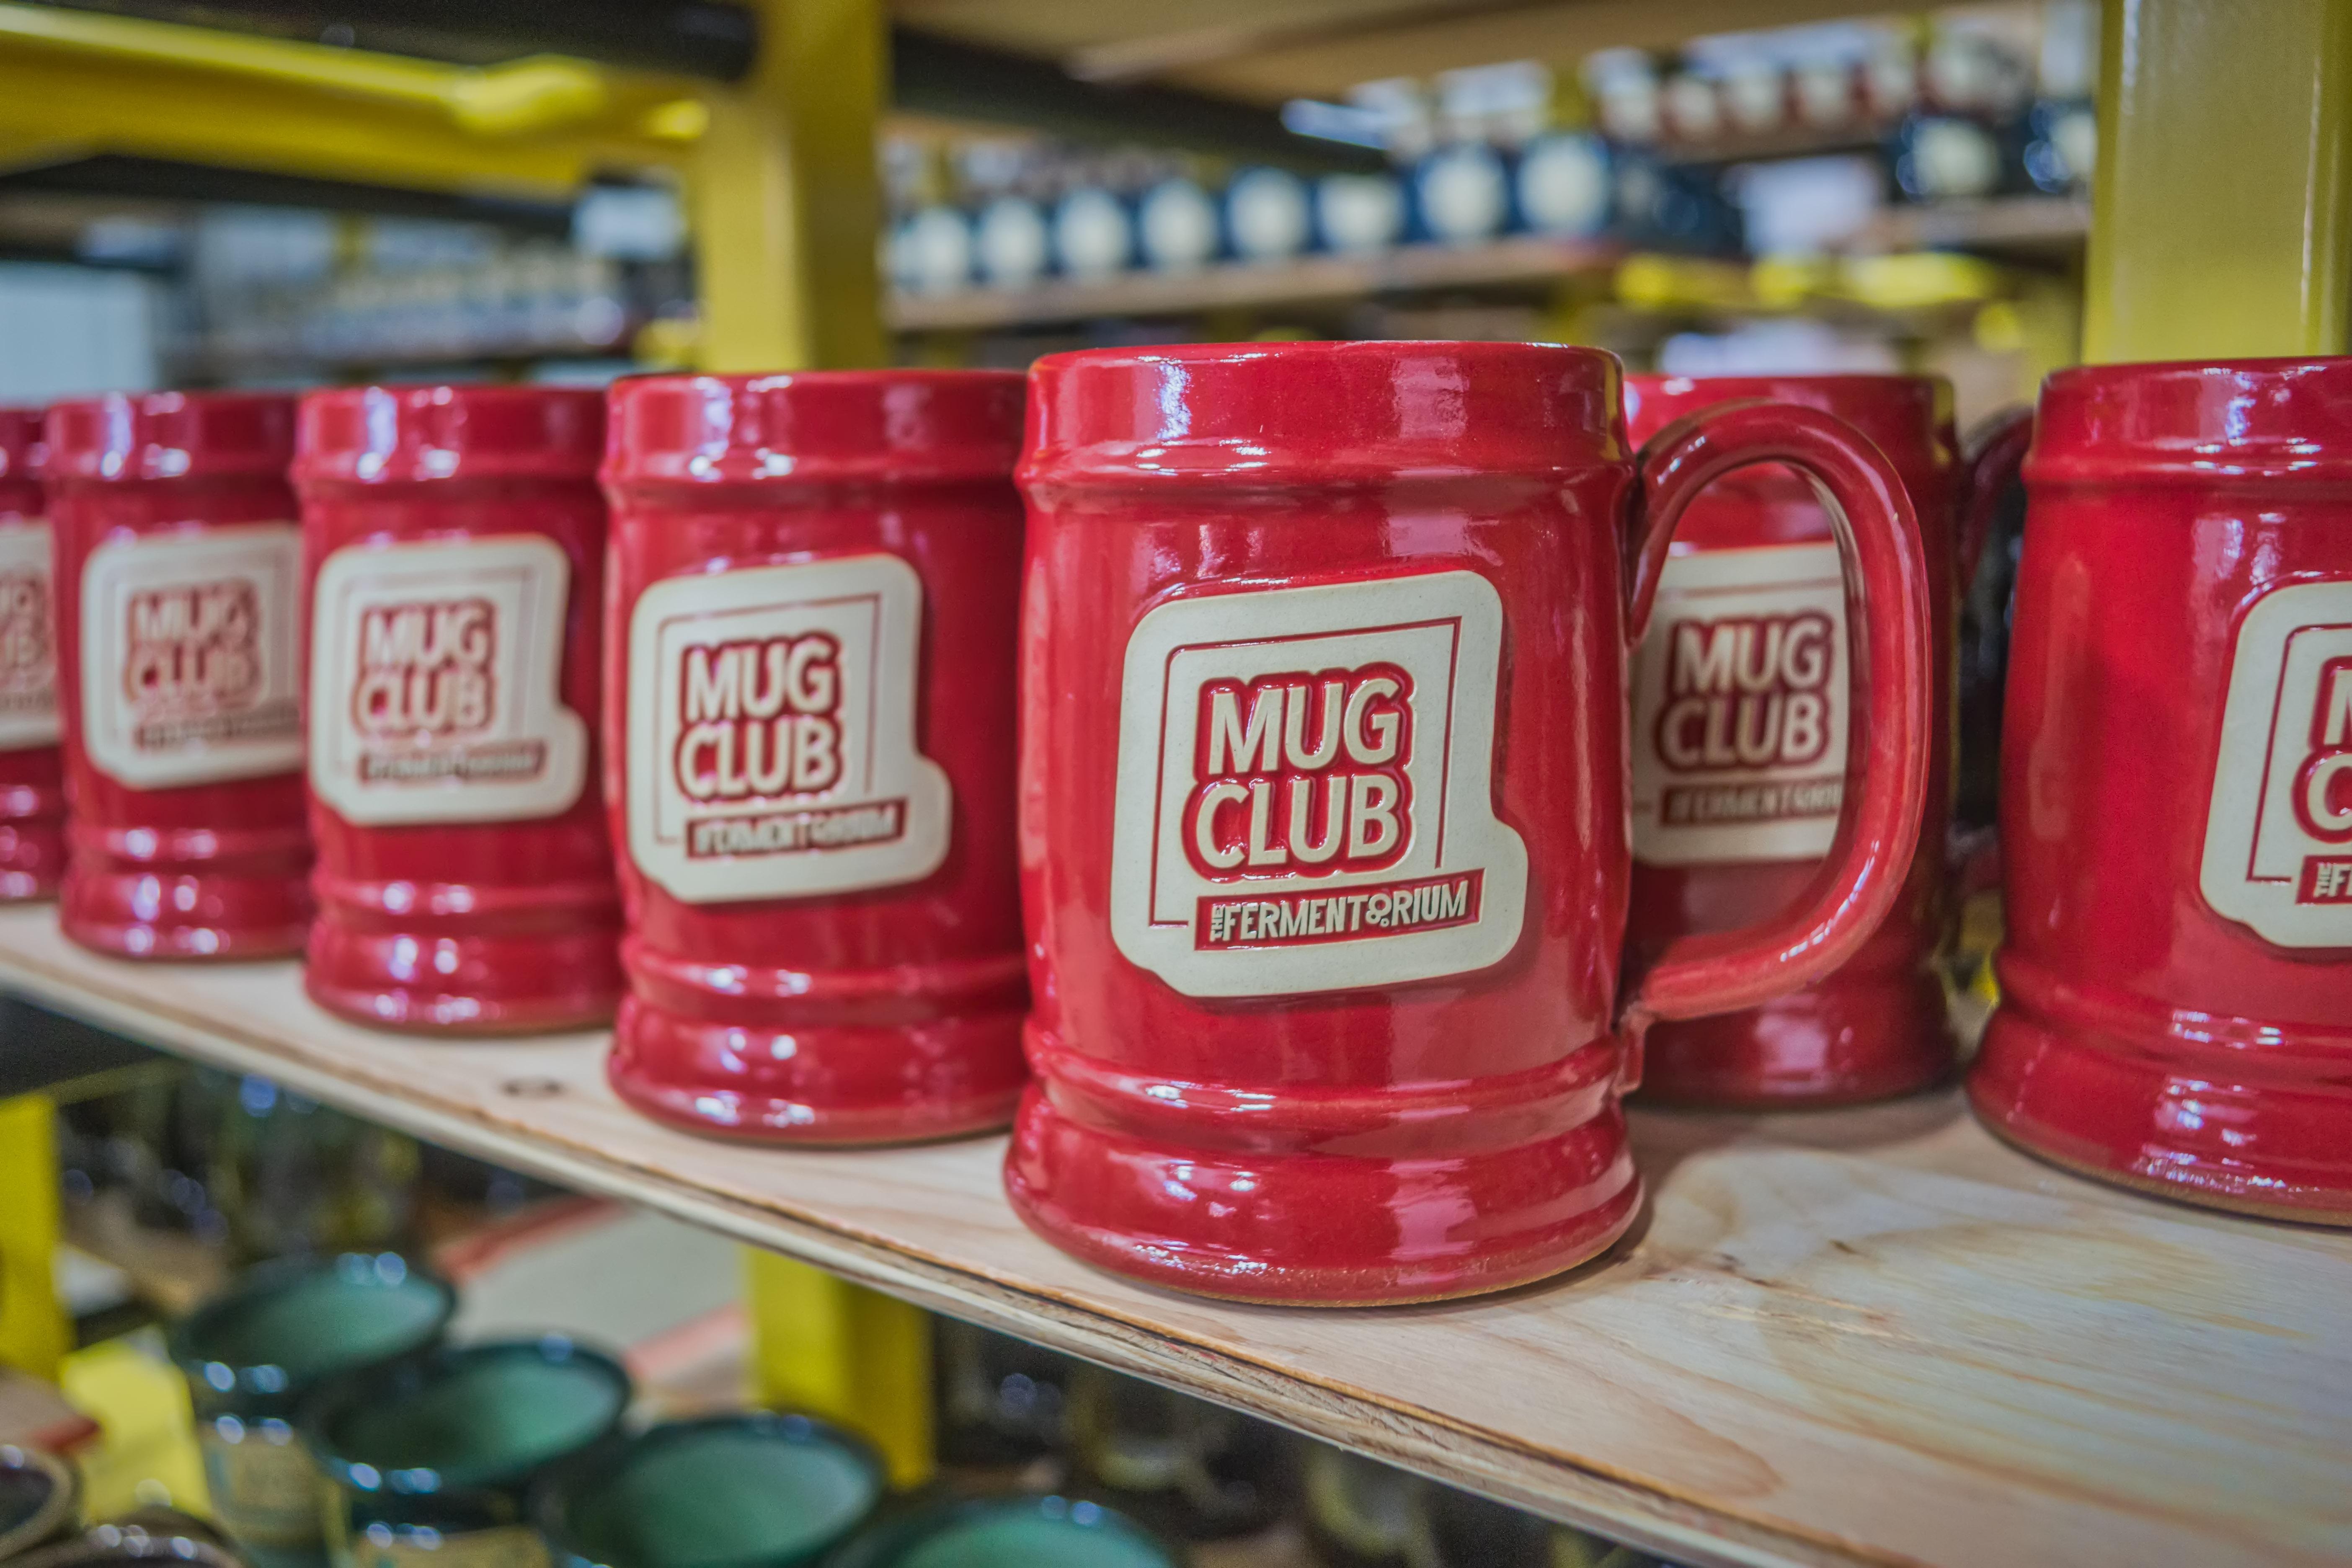 Fermentorium Mug Club steins